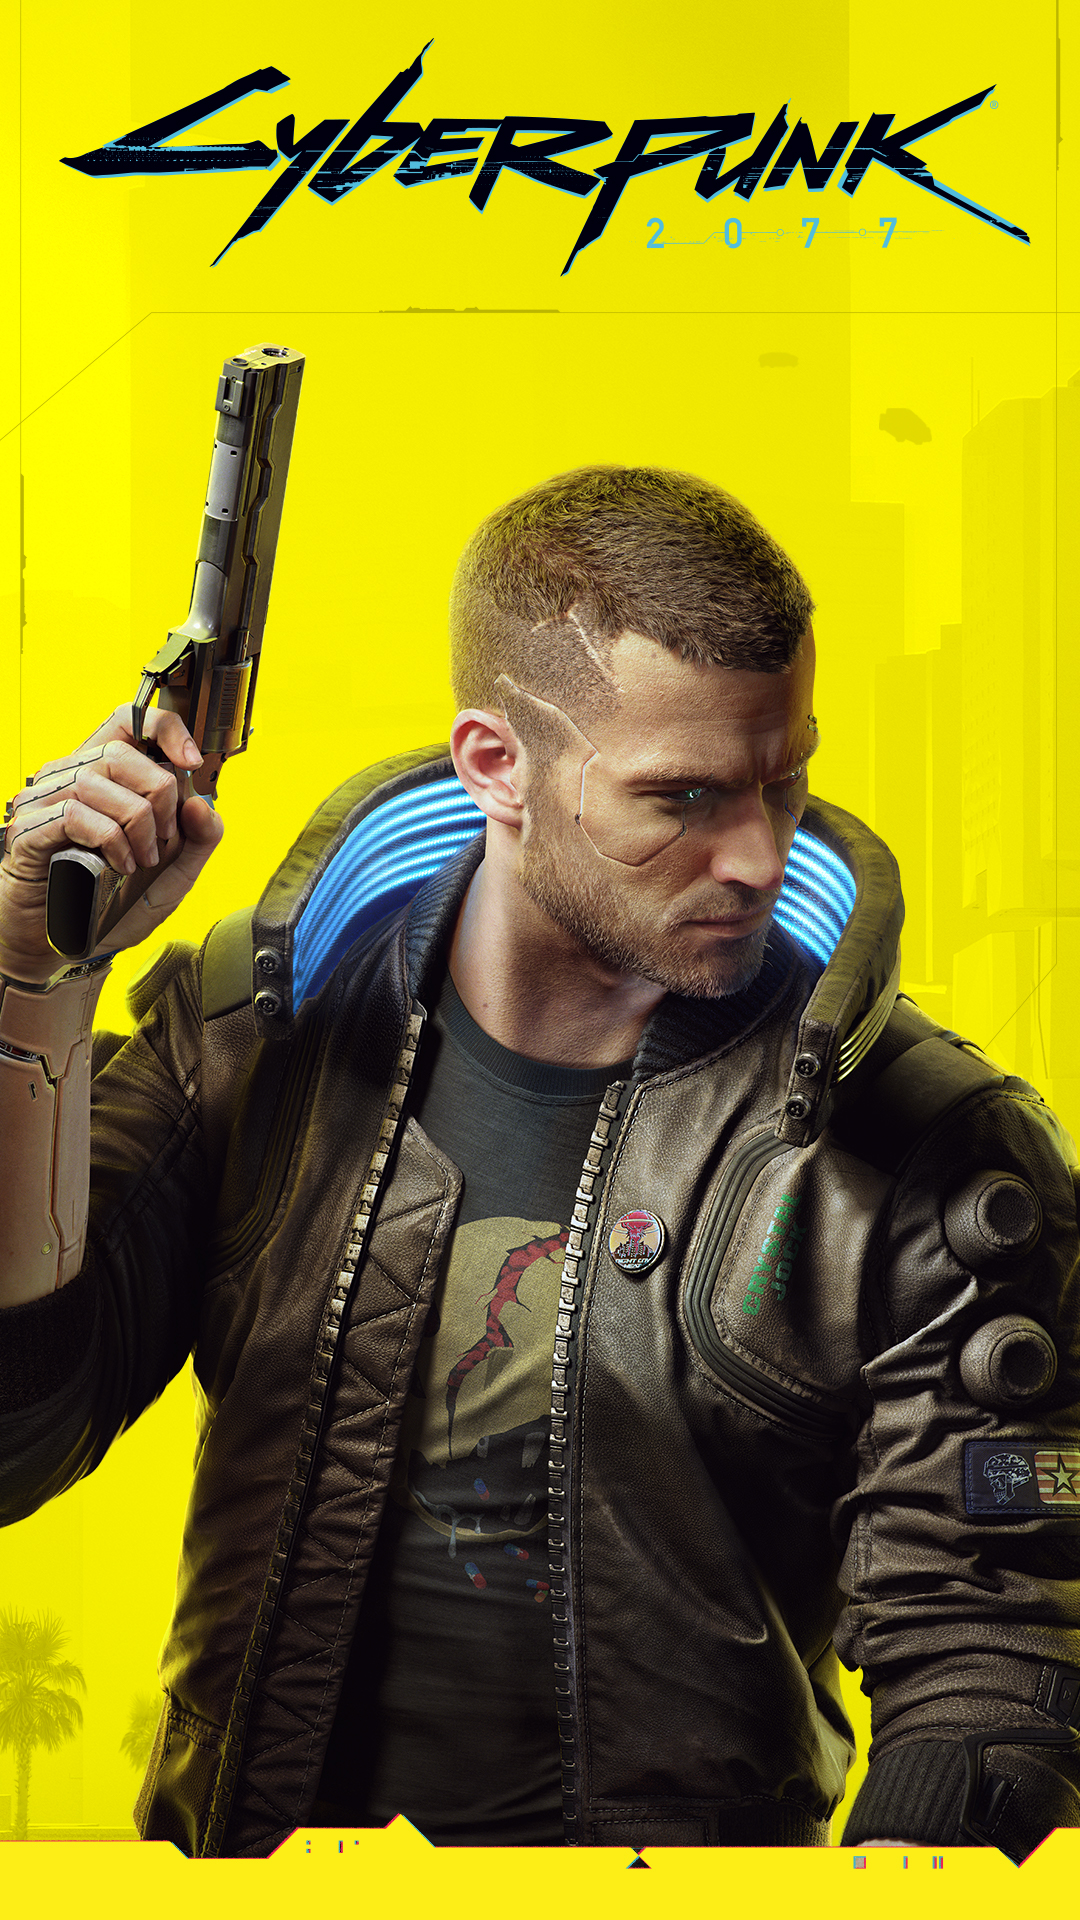 Cyberpunk 2077 E3 Presence Spans Public & Behind Closed ...